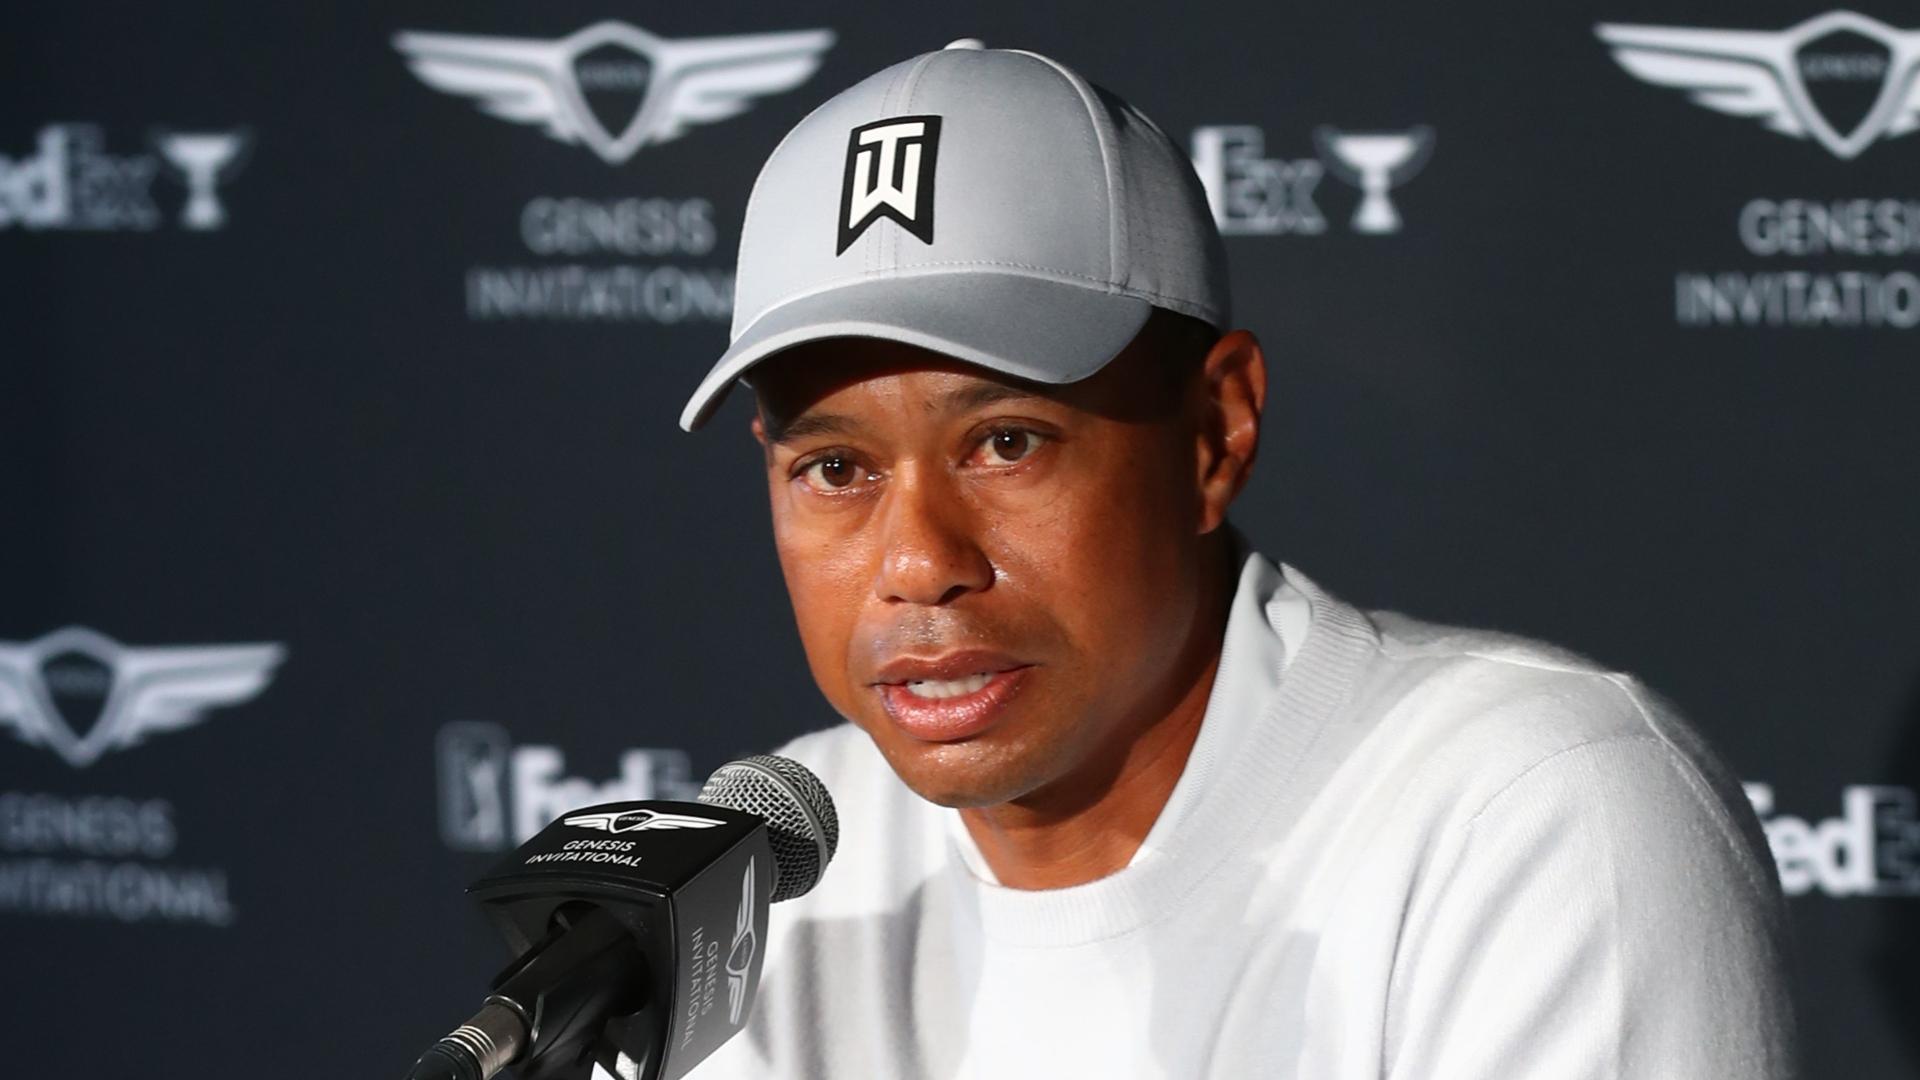 Tiger Woods speaks out on 'shocking tragedy' after George Floyd death